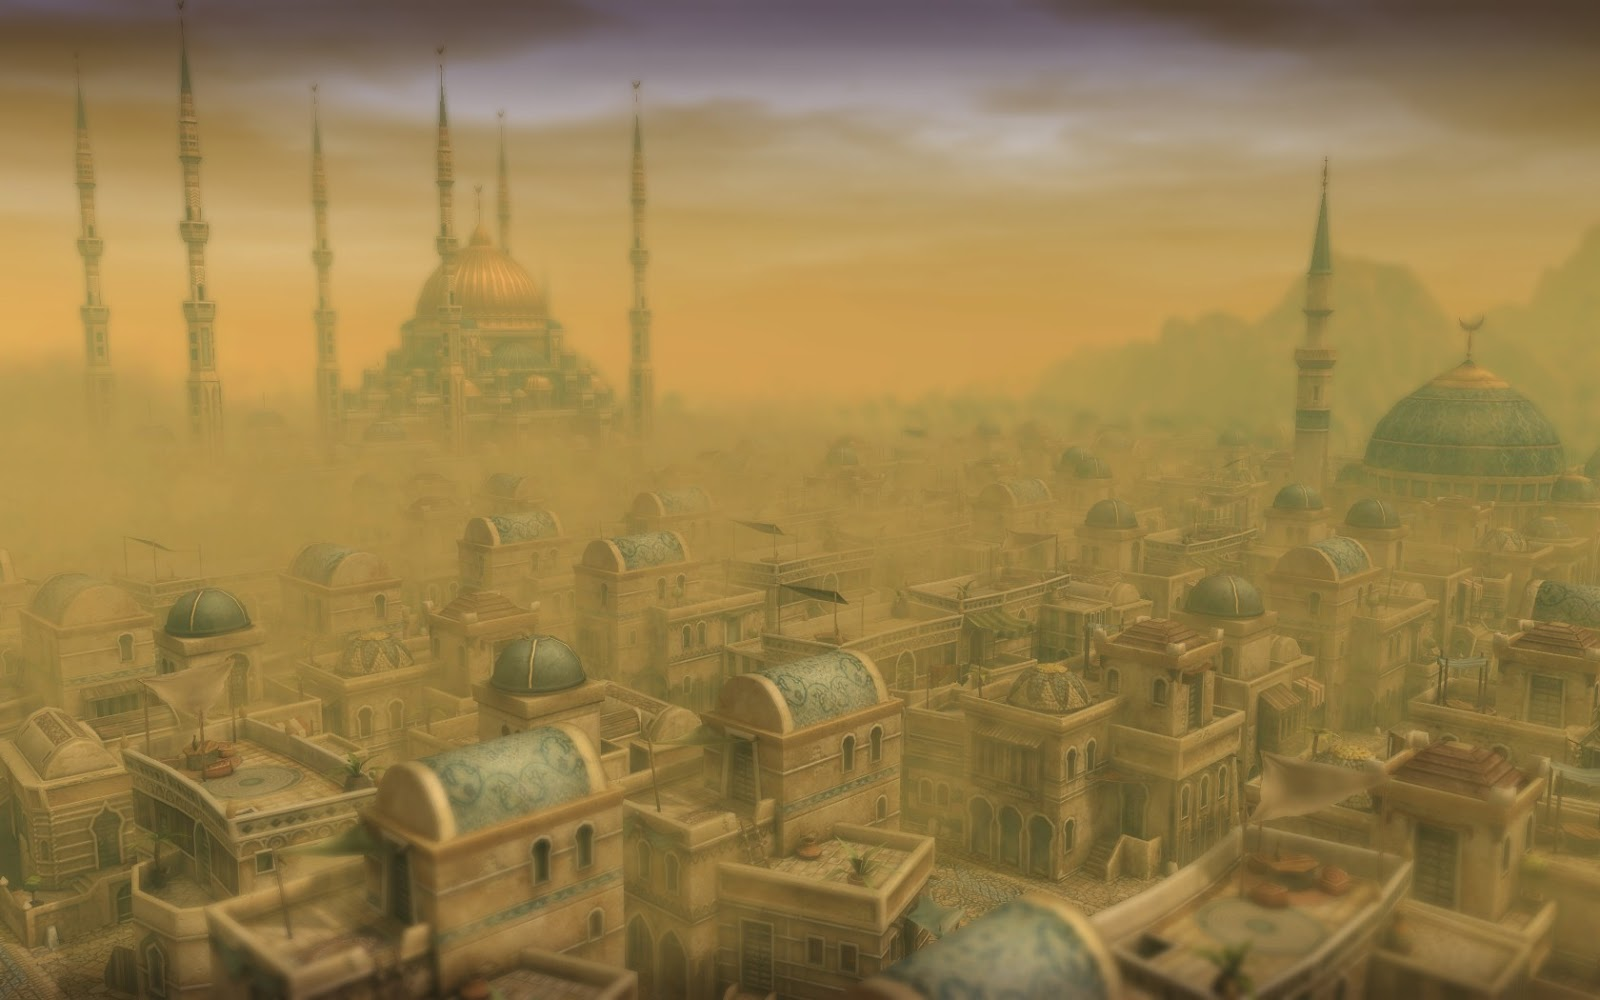 The Everwayan: The Sandgates Of The Sixth Kingdom.